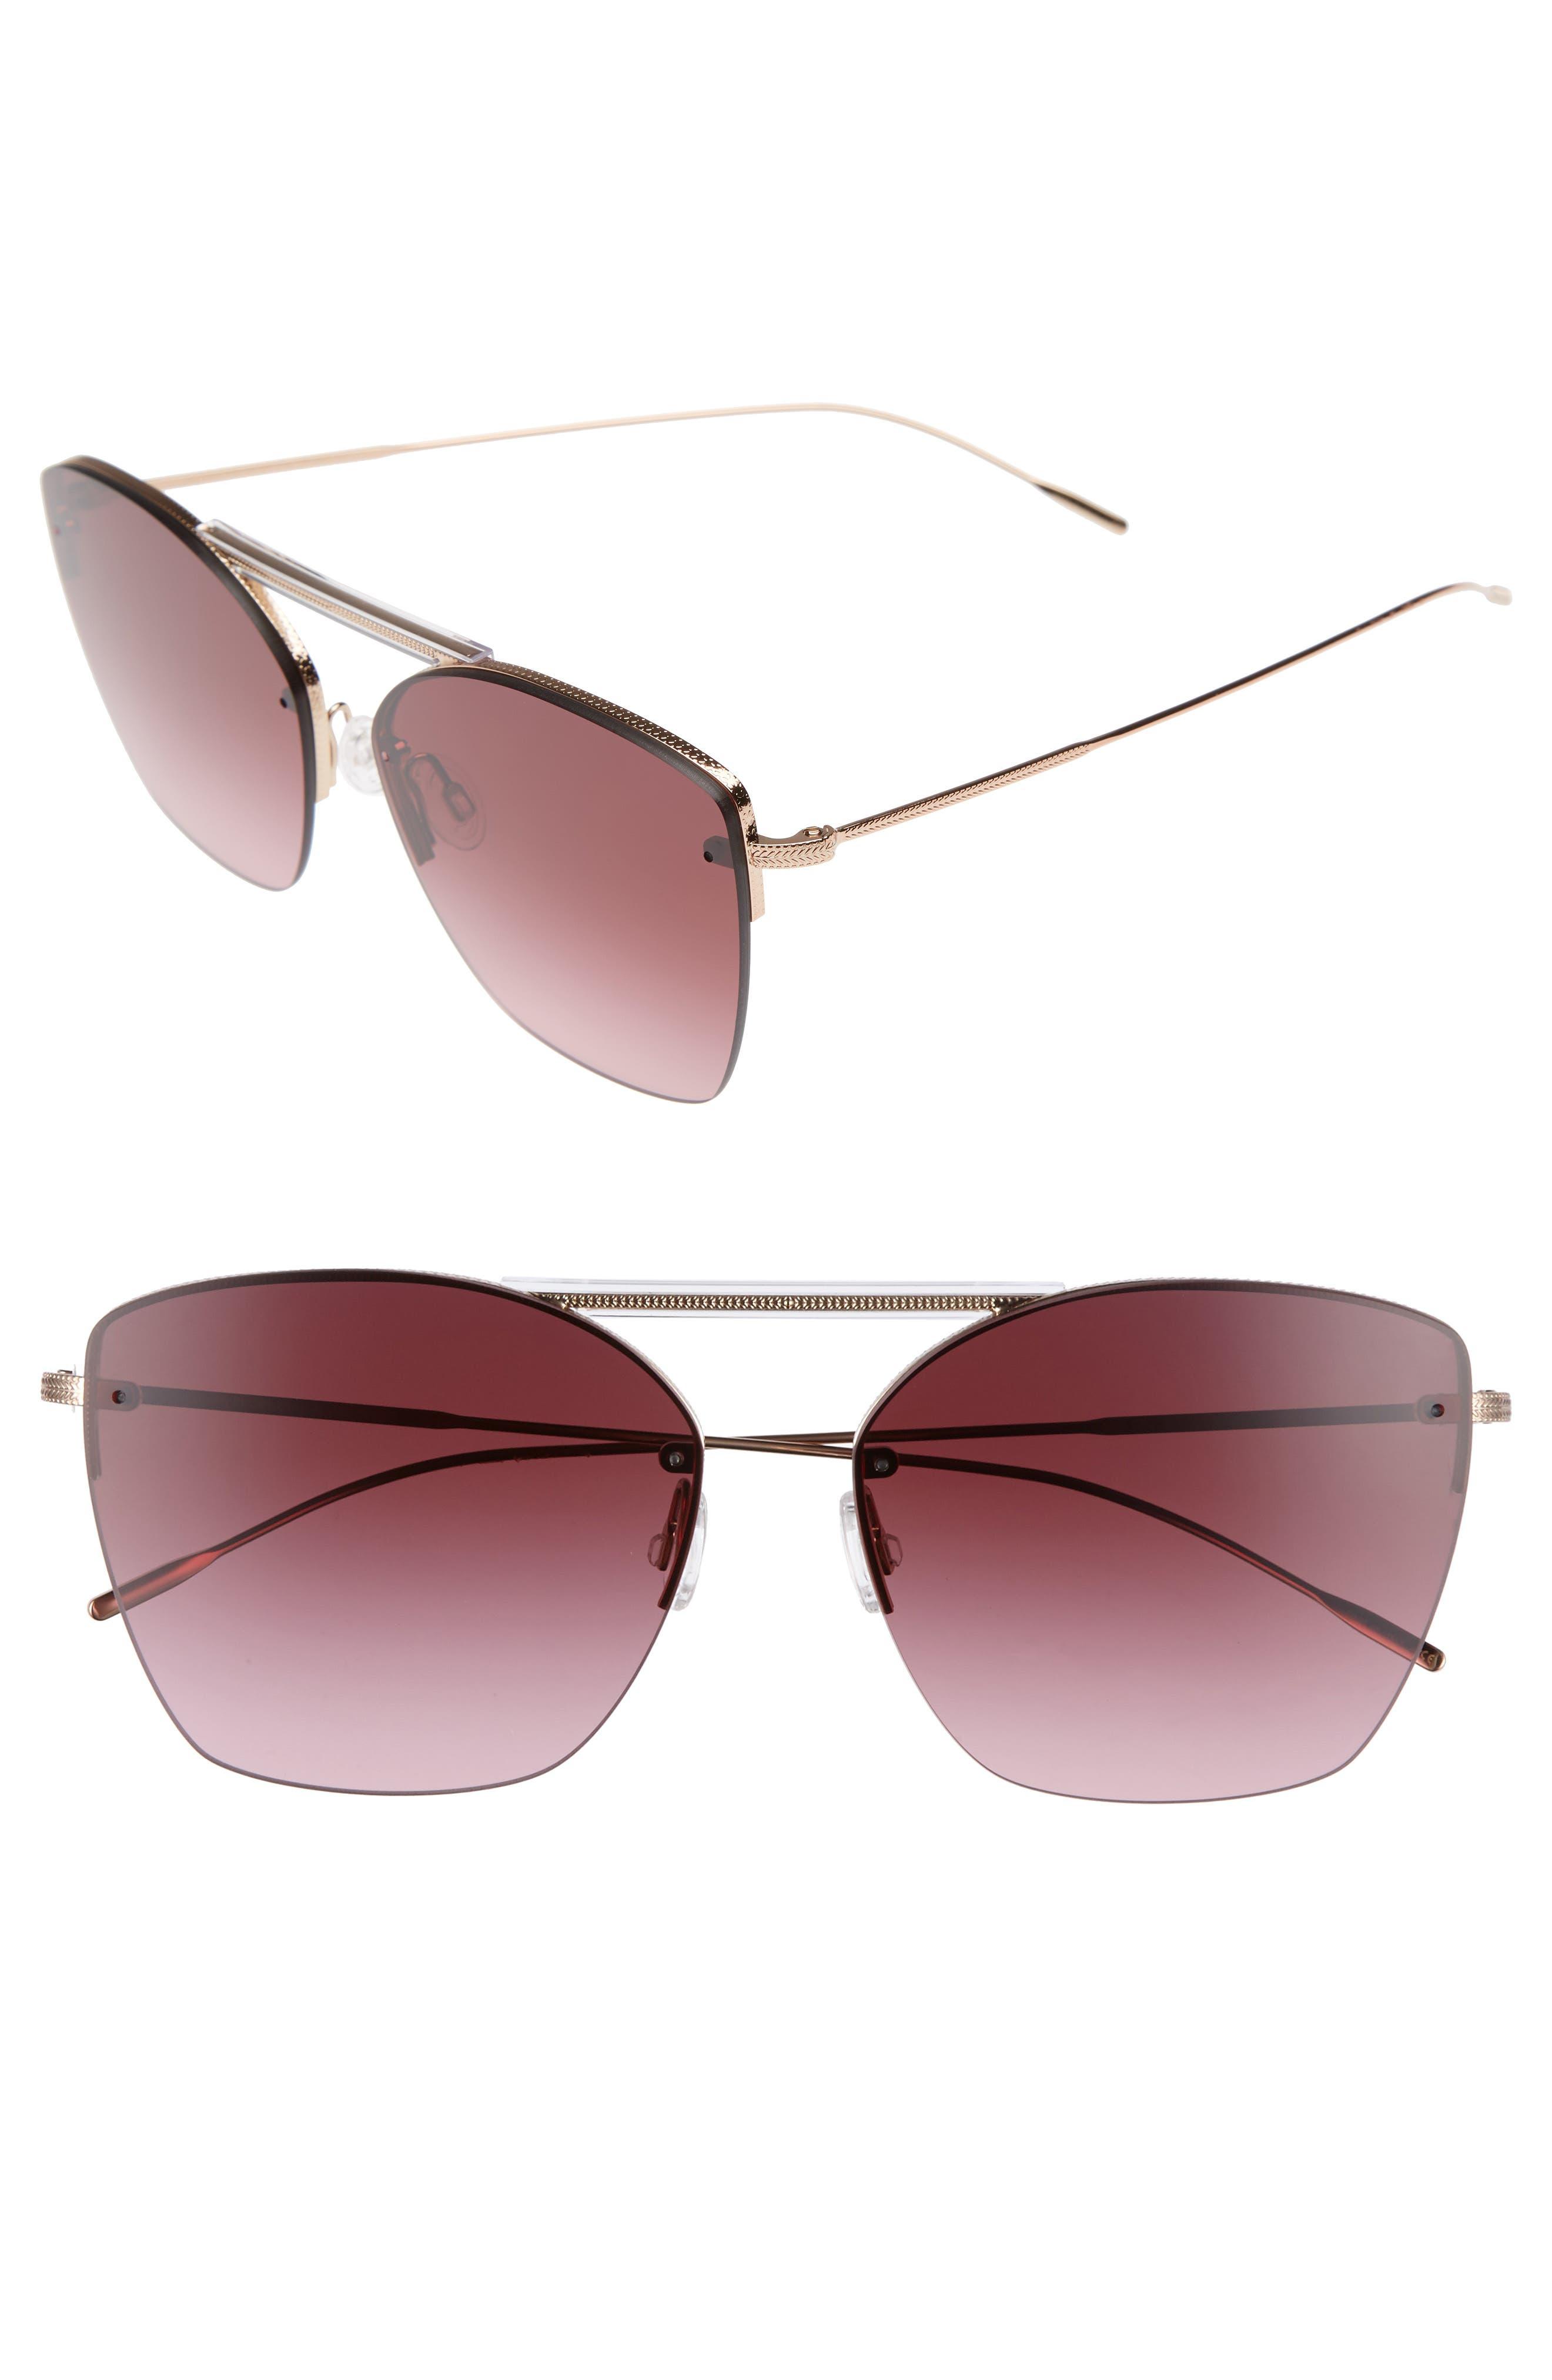 Ziane 61mm Rimless Sunglasses,                             Main thumbnail 1, color,                             650